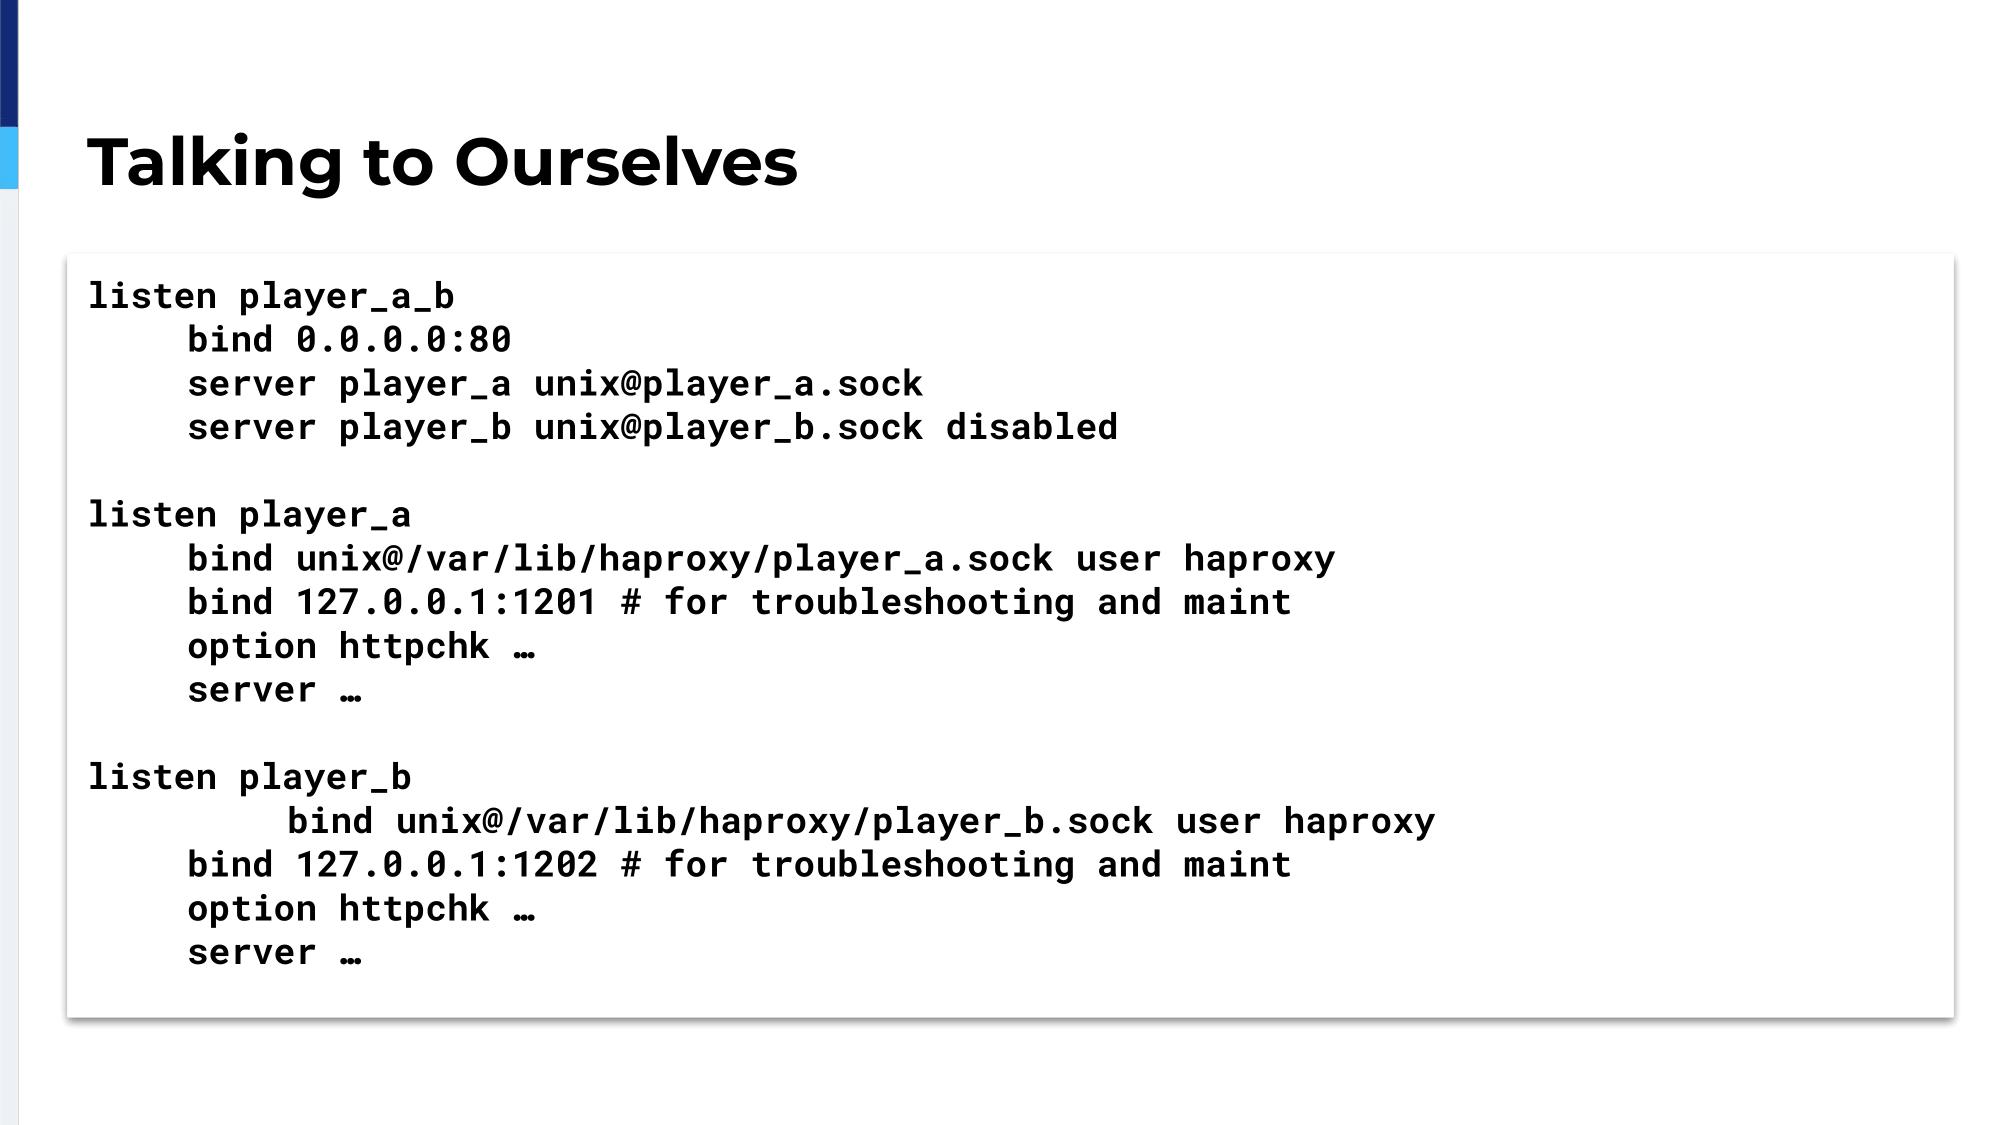 haproxyconf2019_haproxy load balancing at vimeo_andrew rodland_19